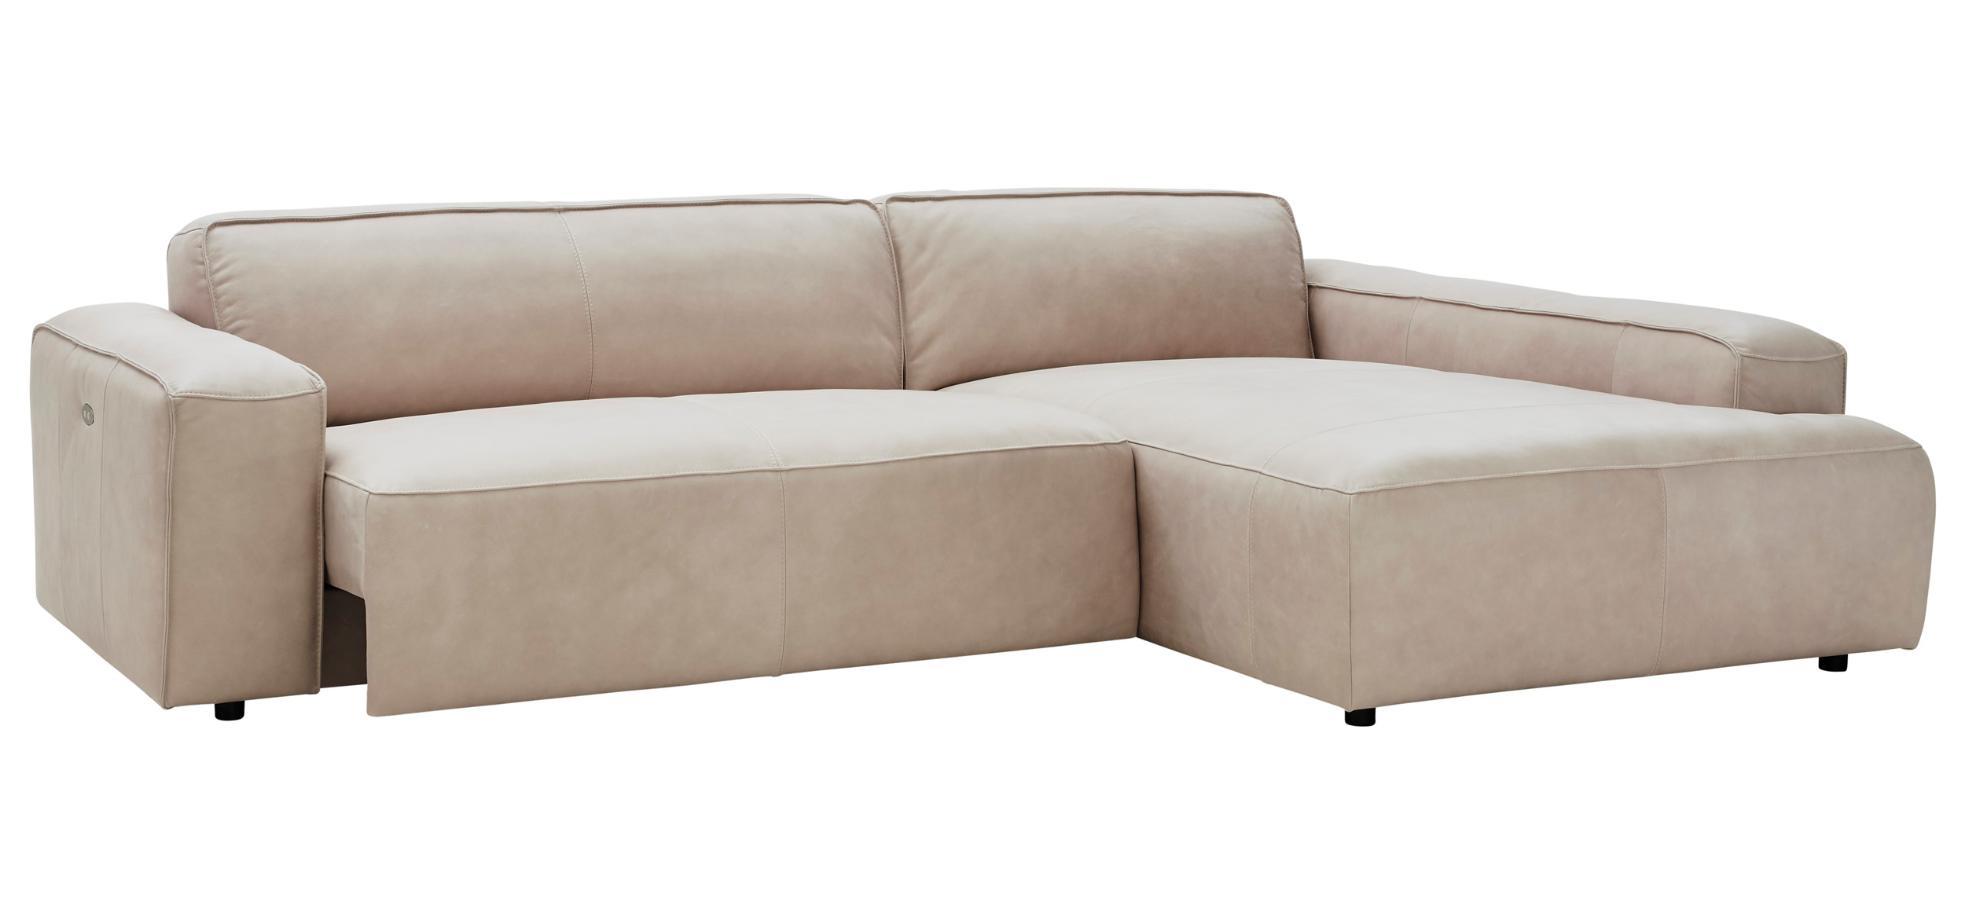 Full Size of Natura Sofa Kansas Couch Newport Home Denver Gebraucht Love Polsterecke Krause Company Günstig Kaufen Canape Ecksofa Garten Spannbezug Langes Abnehmbarer Sofa Natura Sofa